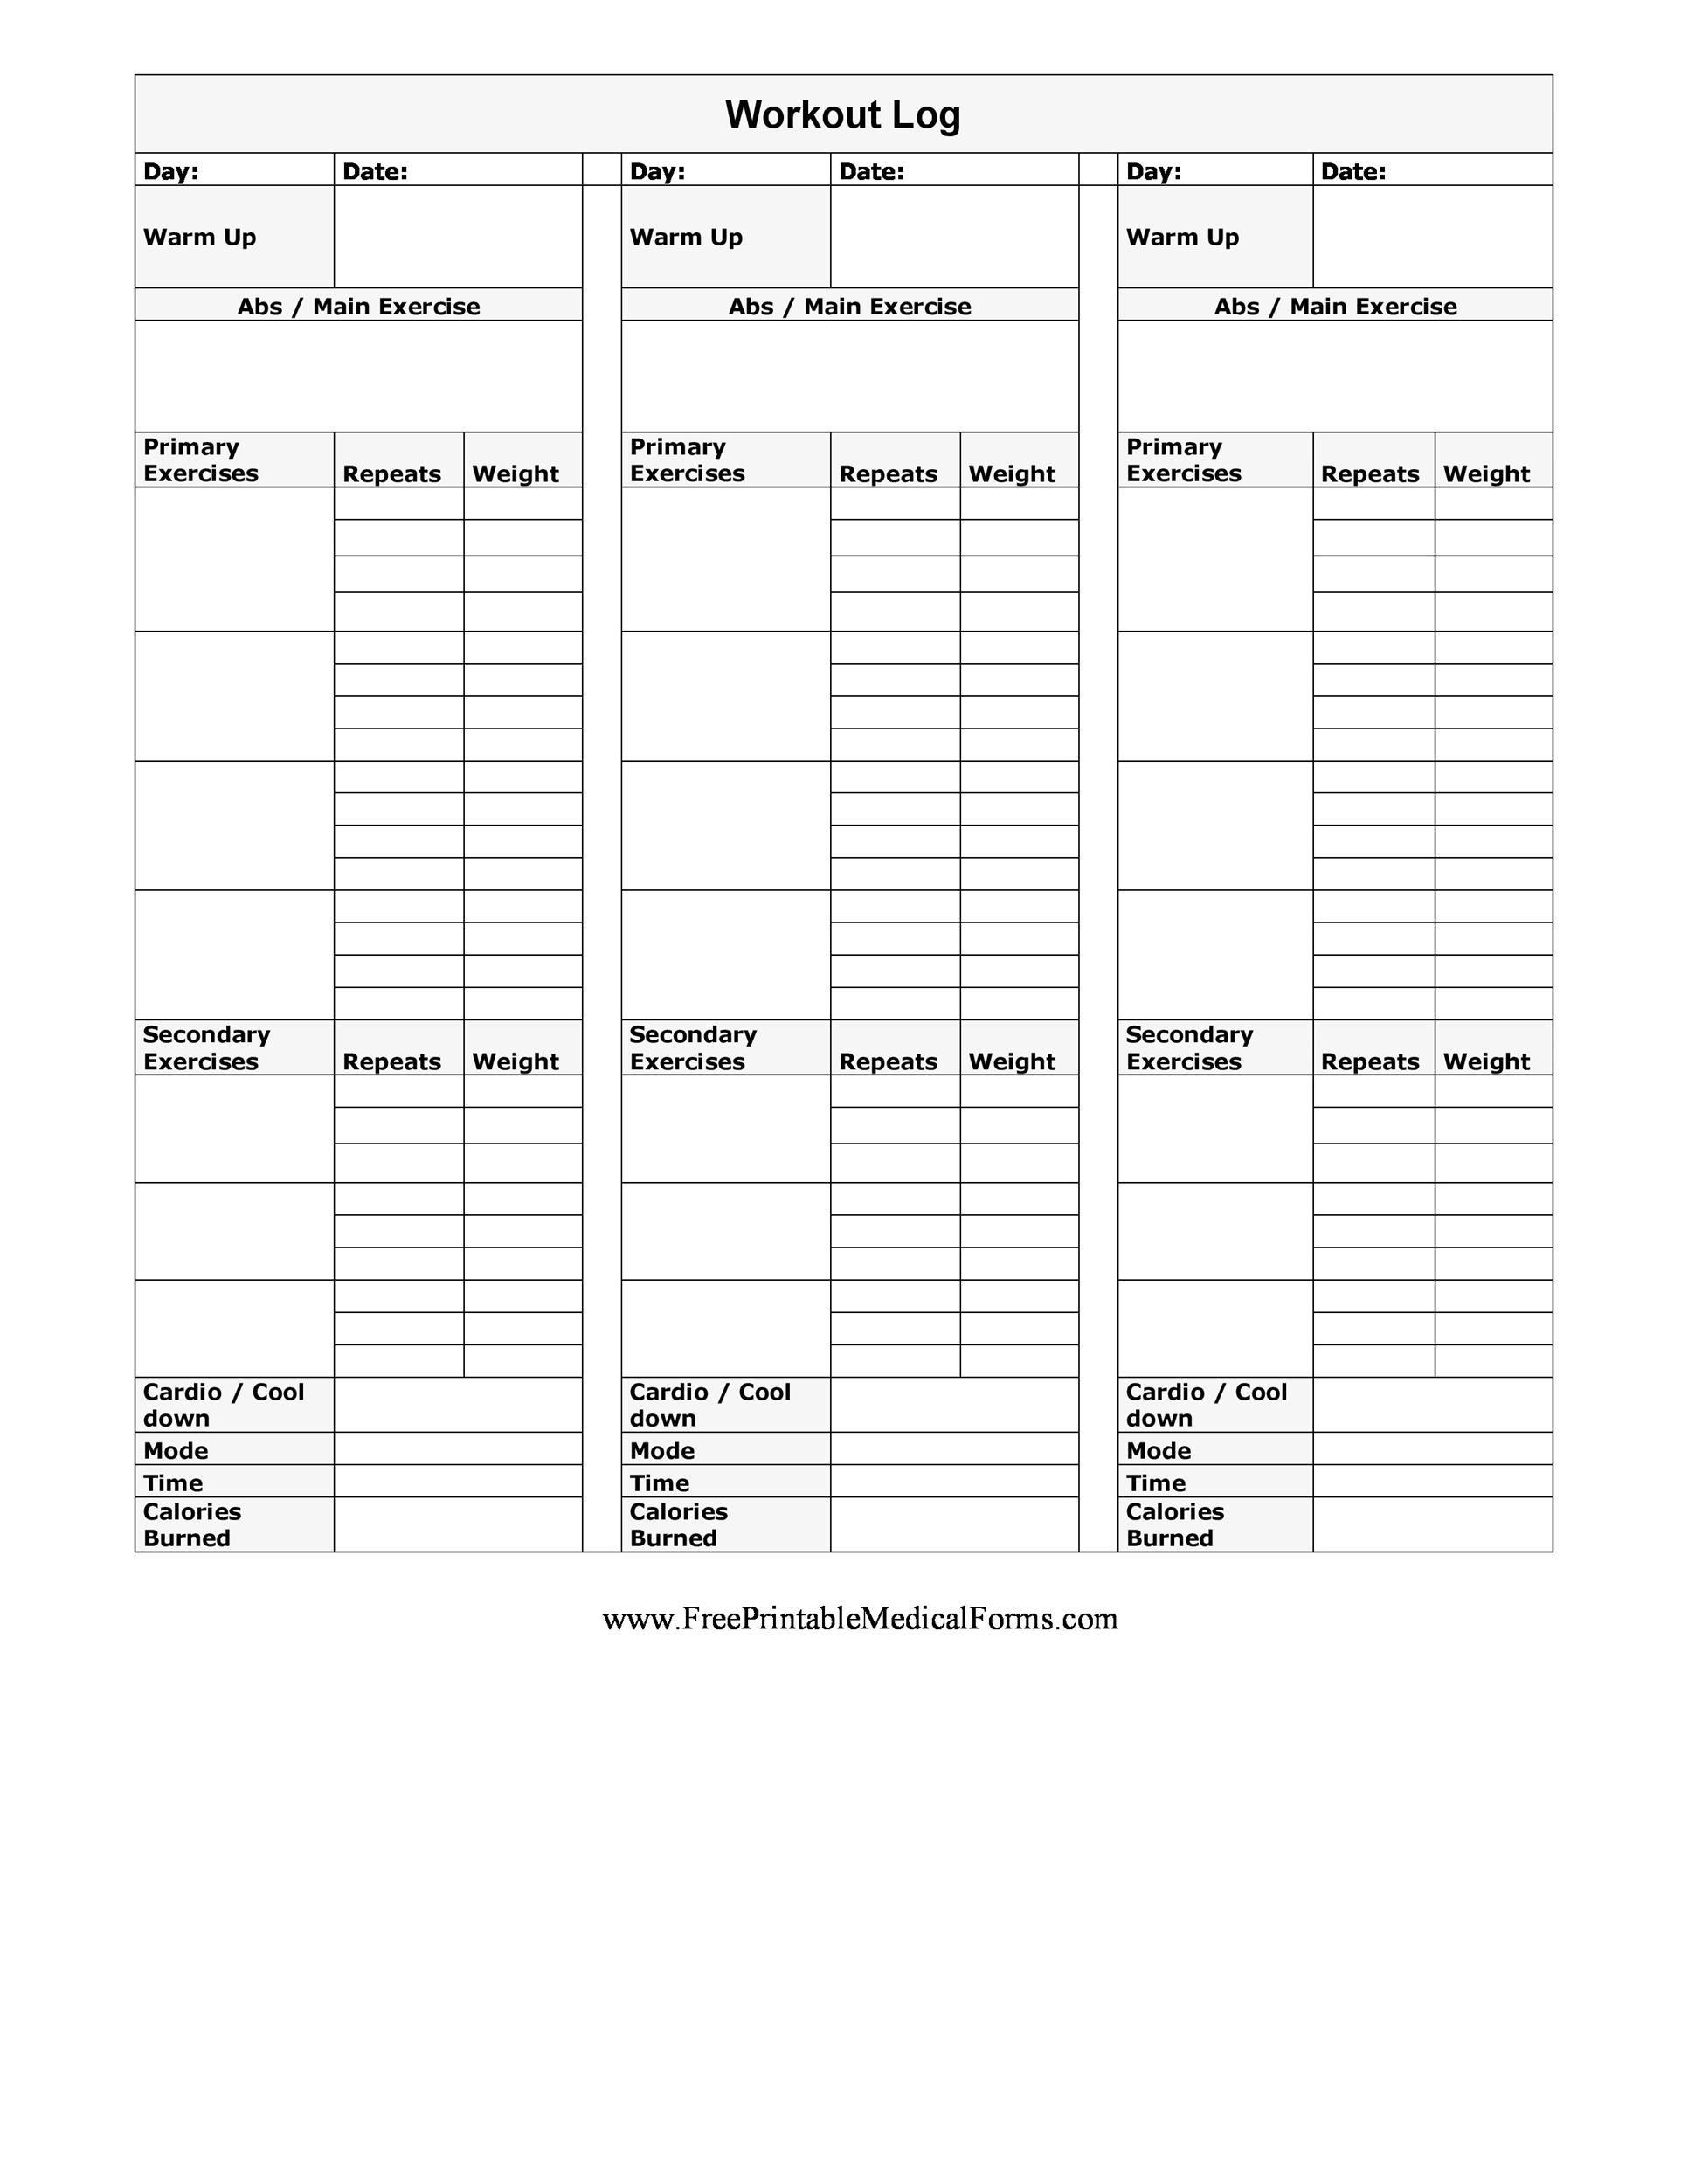 40+ Effective Workout Log & Calendar Templates ᐅ Templatelab